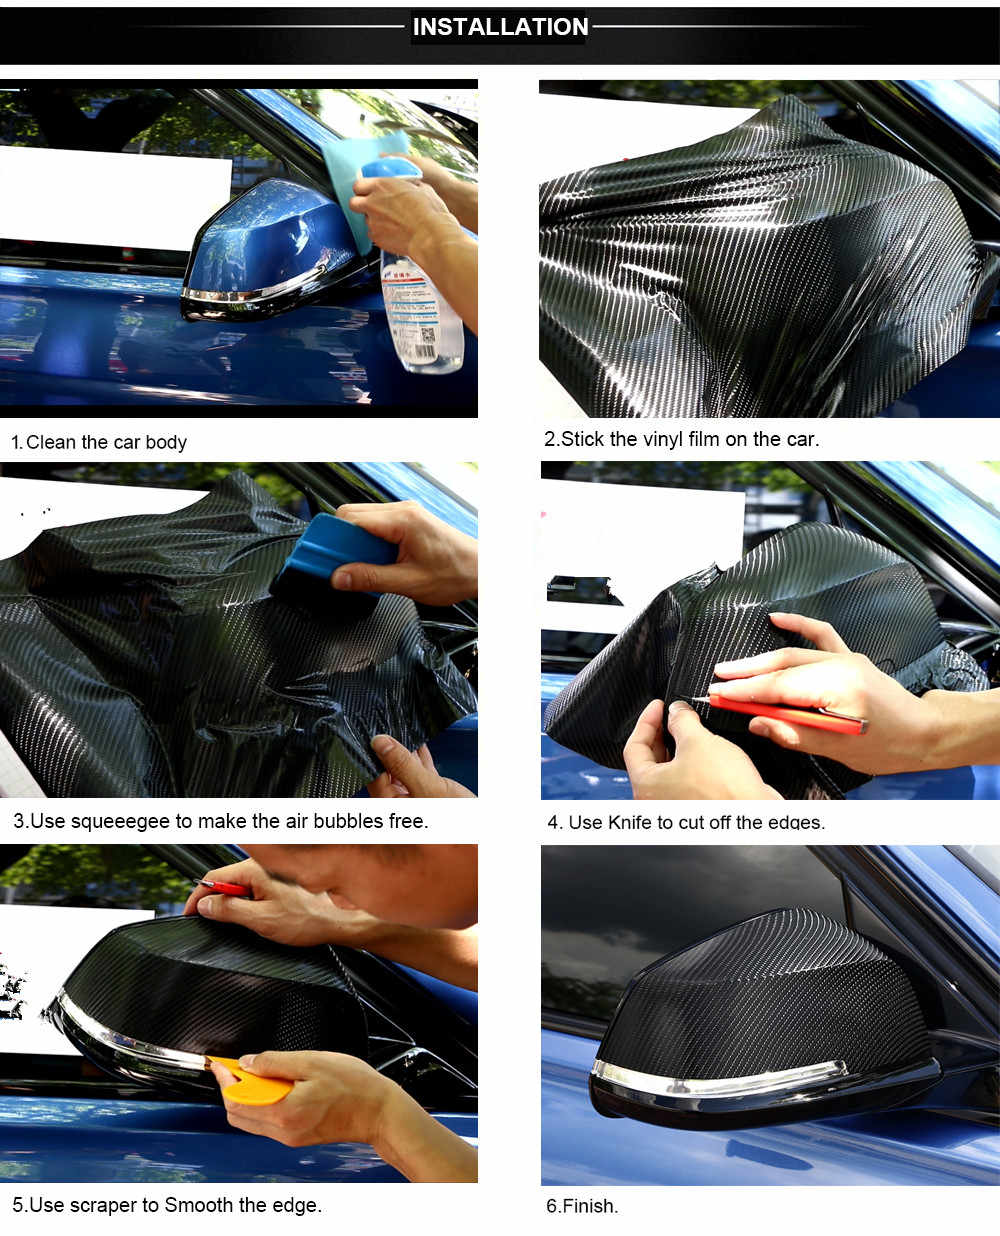 30X127 Cm 3D 5D Mobil Serat Karbon VINYL Membungkus Film Stiker dan Stiker untuk Ford Transit Ranger Mustang ka Fusion Fokus F-150